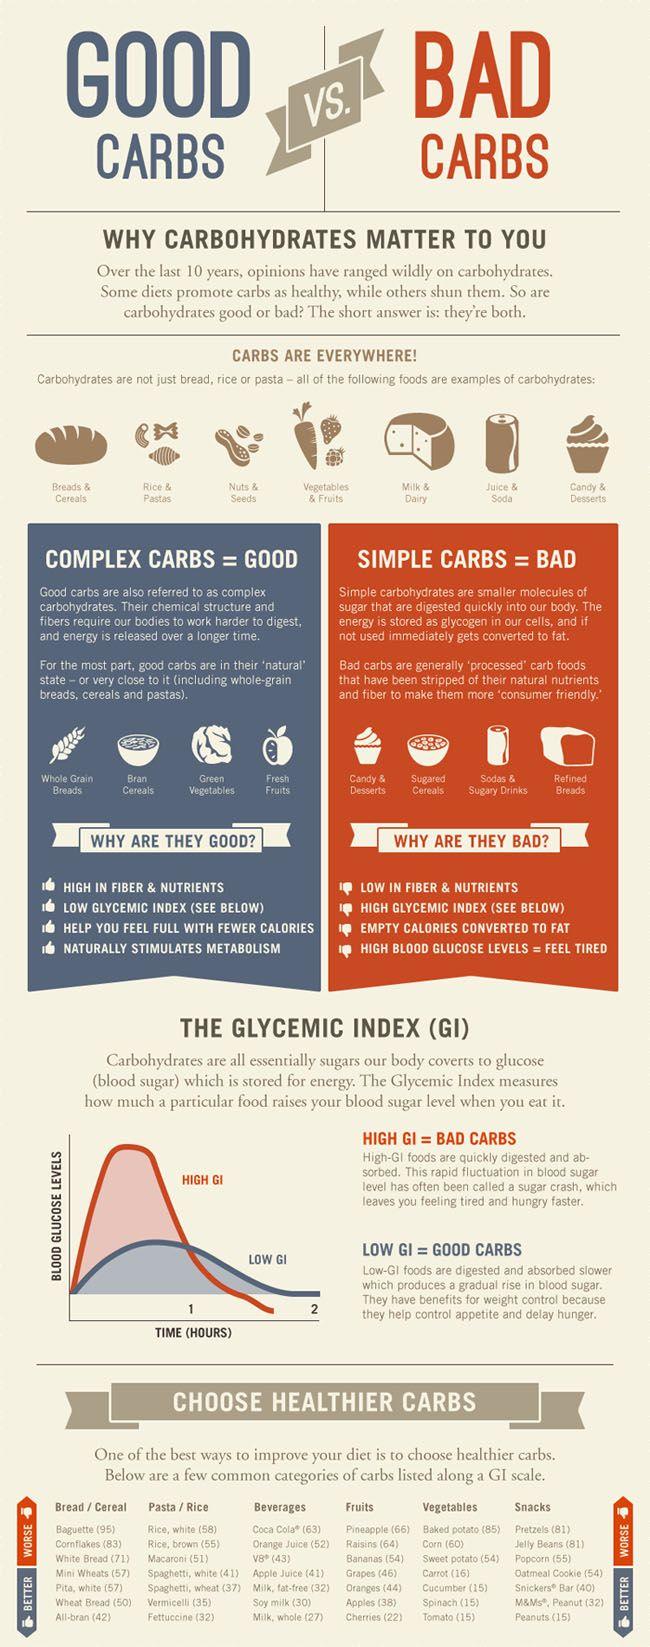 Good Carbs vs. Bad Carbs (Infographic) | LiveBetter with DrVita.com